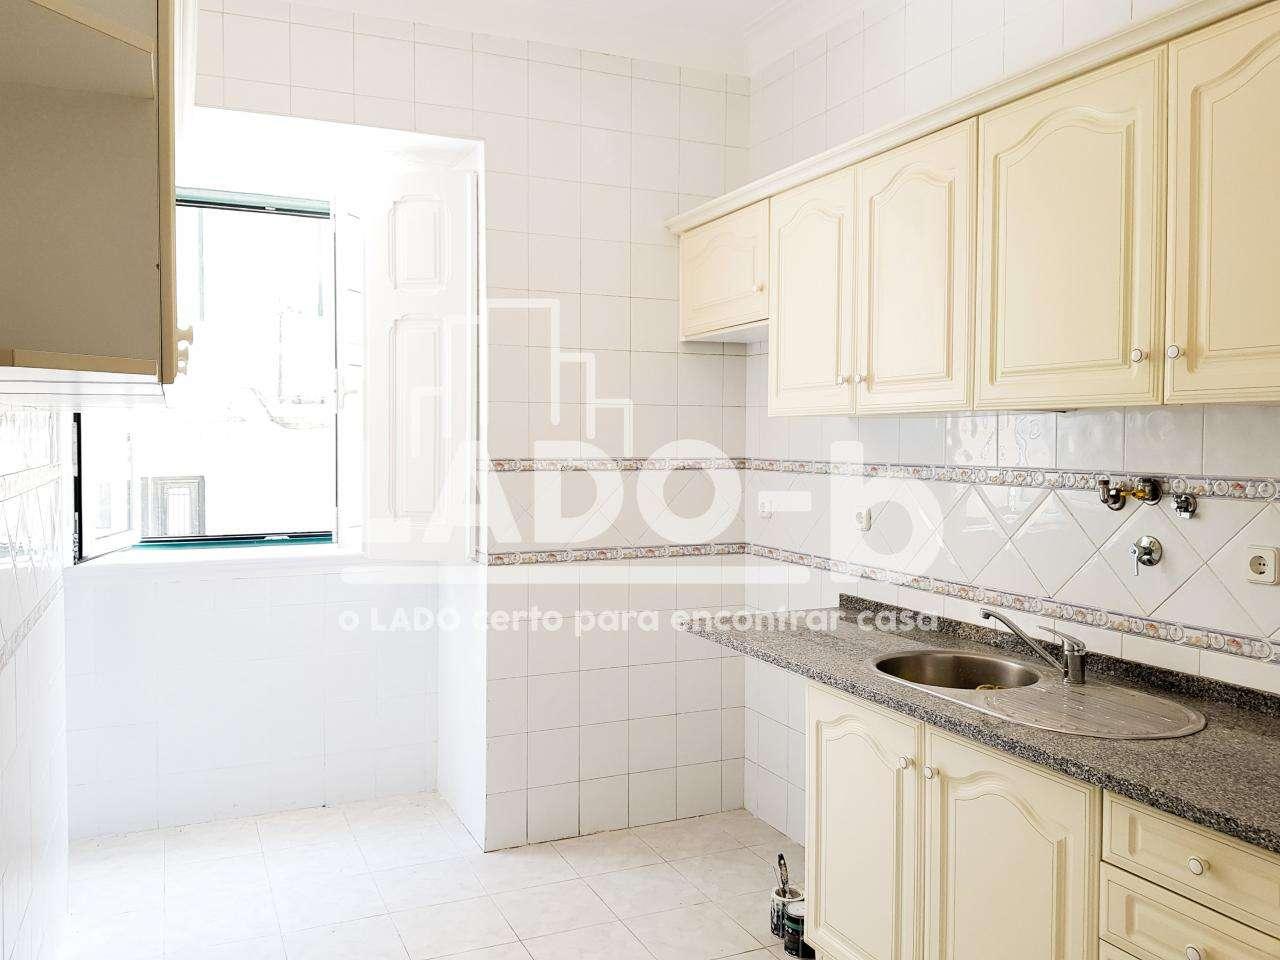 Apartamento para comprar, Estrela, Lisboa - Foto 16